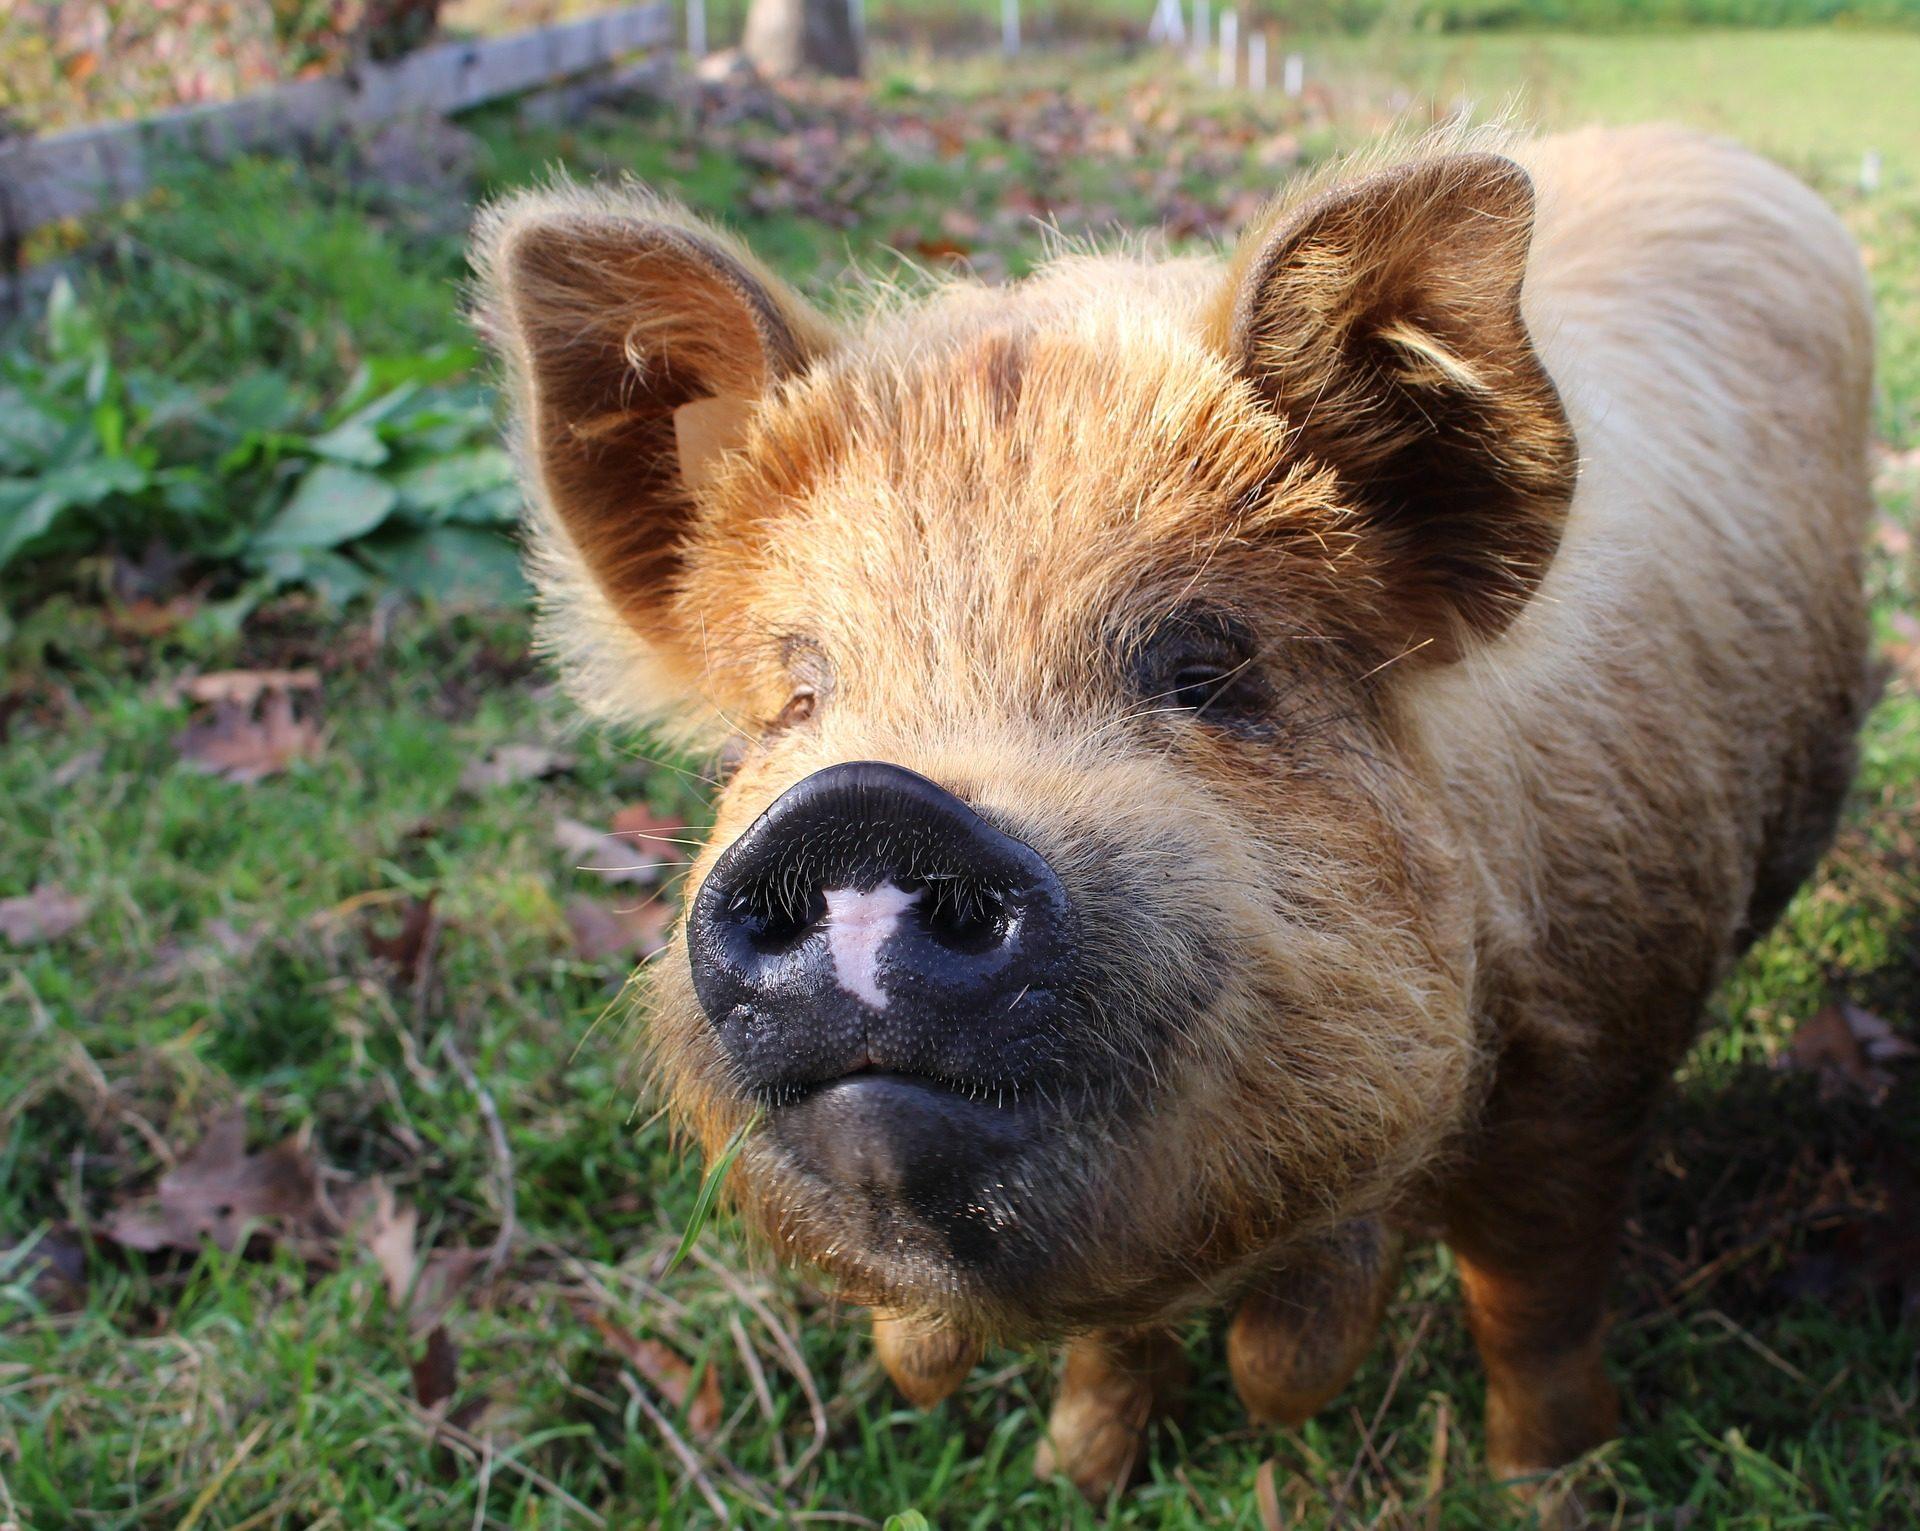 cerdo, γουρ�χοιρινό κρέας�, puerco, ρύγχος, Λόφου, τα αυτιά - Wallpapers HD - Professor-falken.com